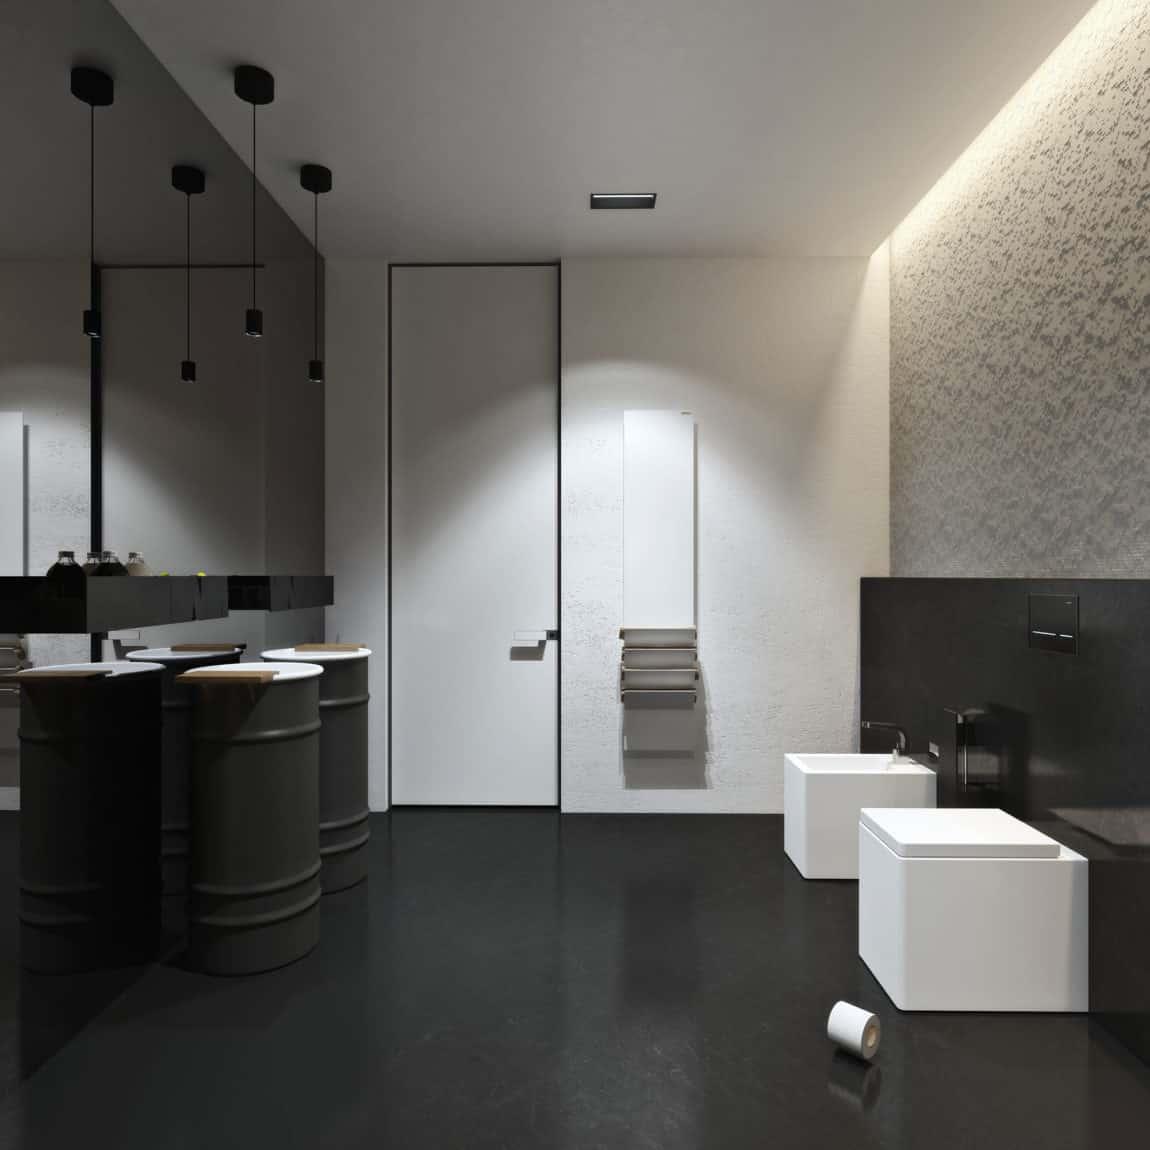 BL1 House by Igor Sirotov Architect (14)